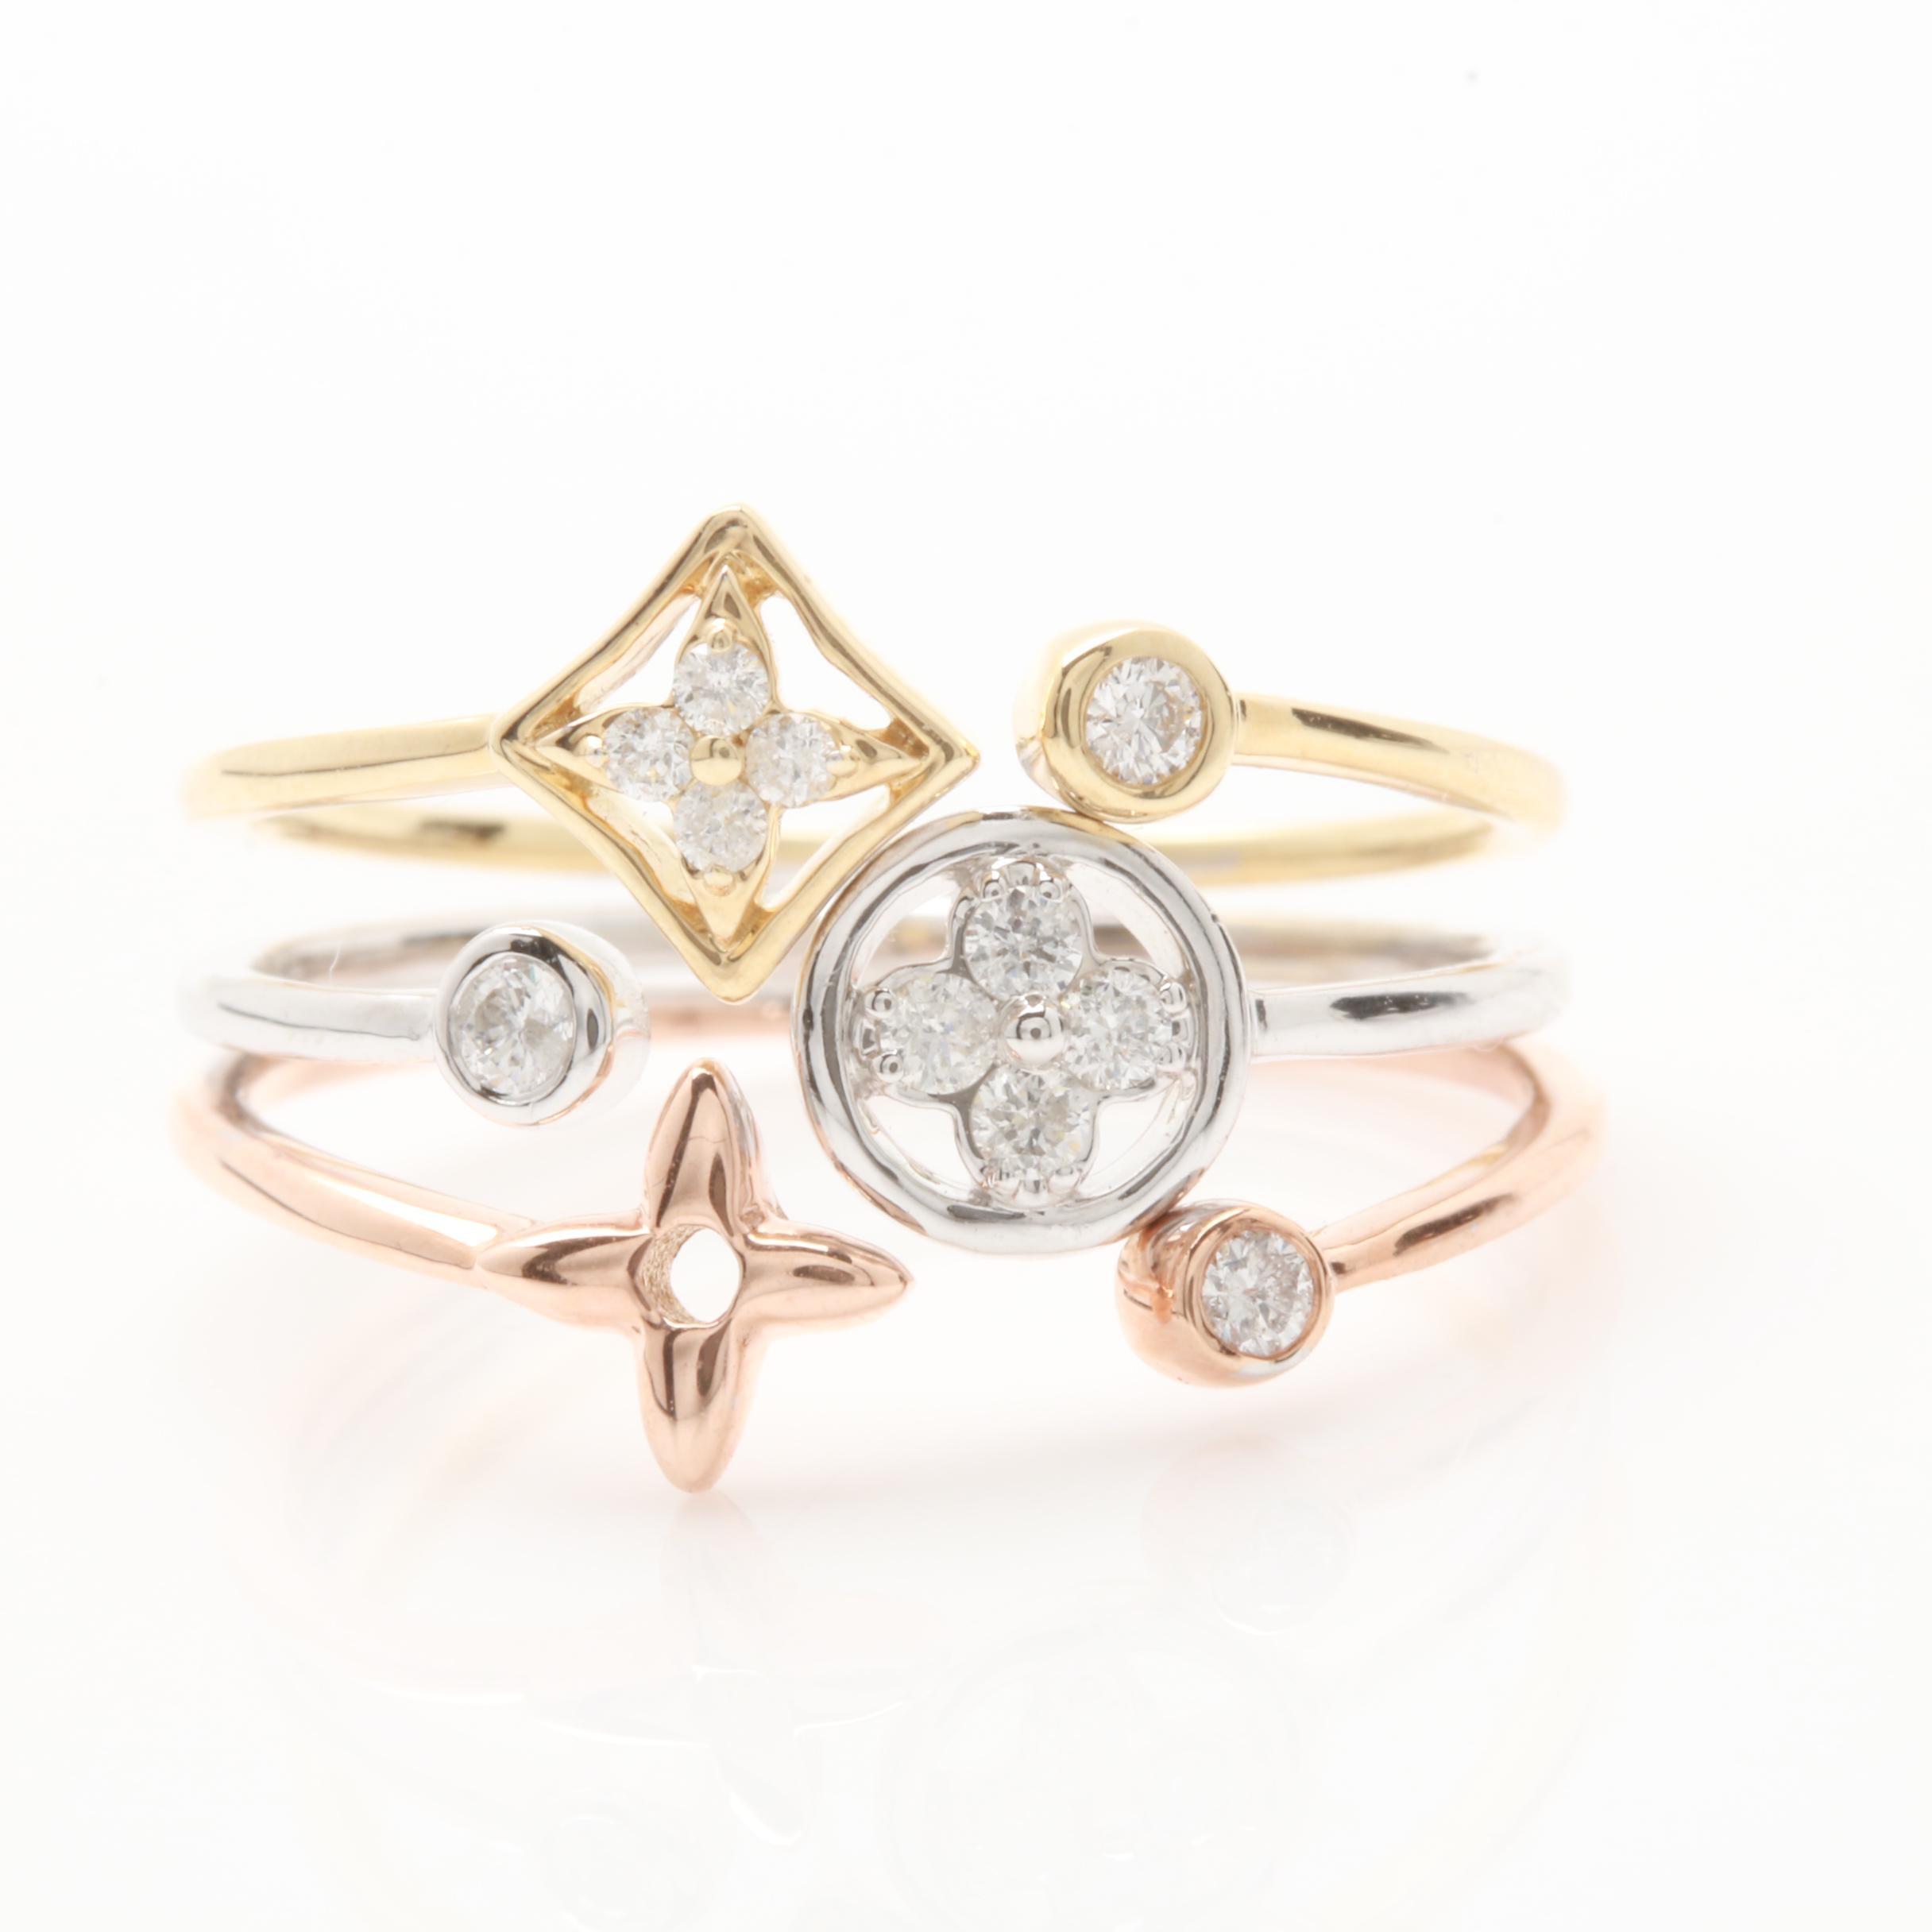 14K Mixed Gold Diamond Ring